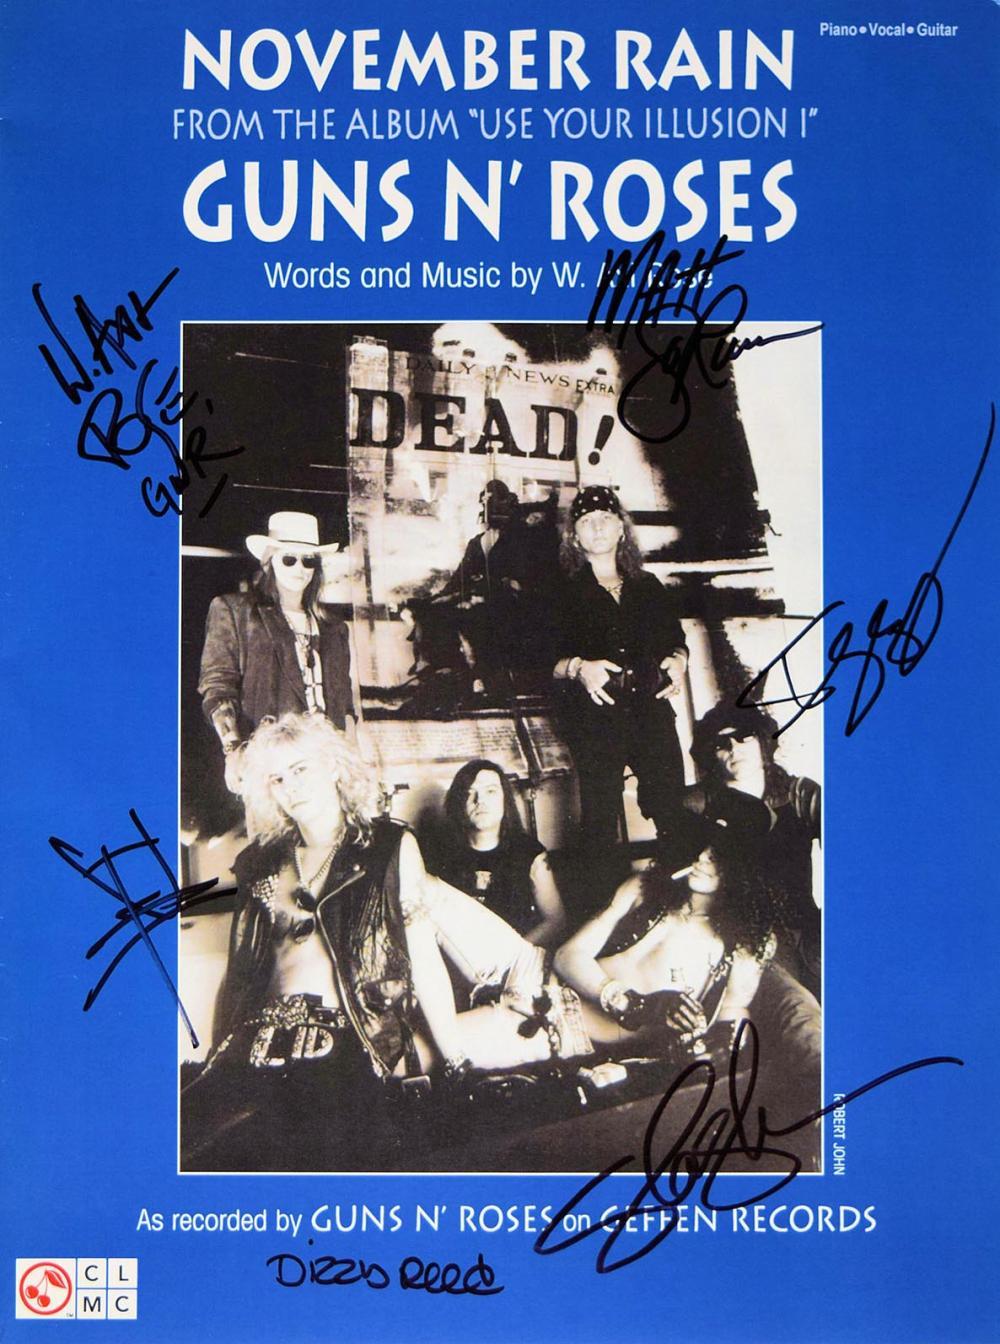 Guns N' Roses signed sheet music